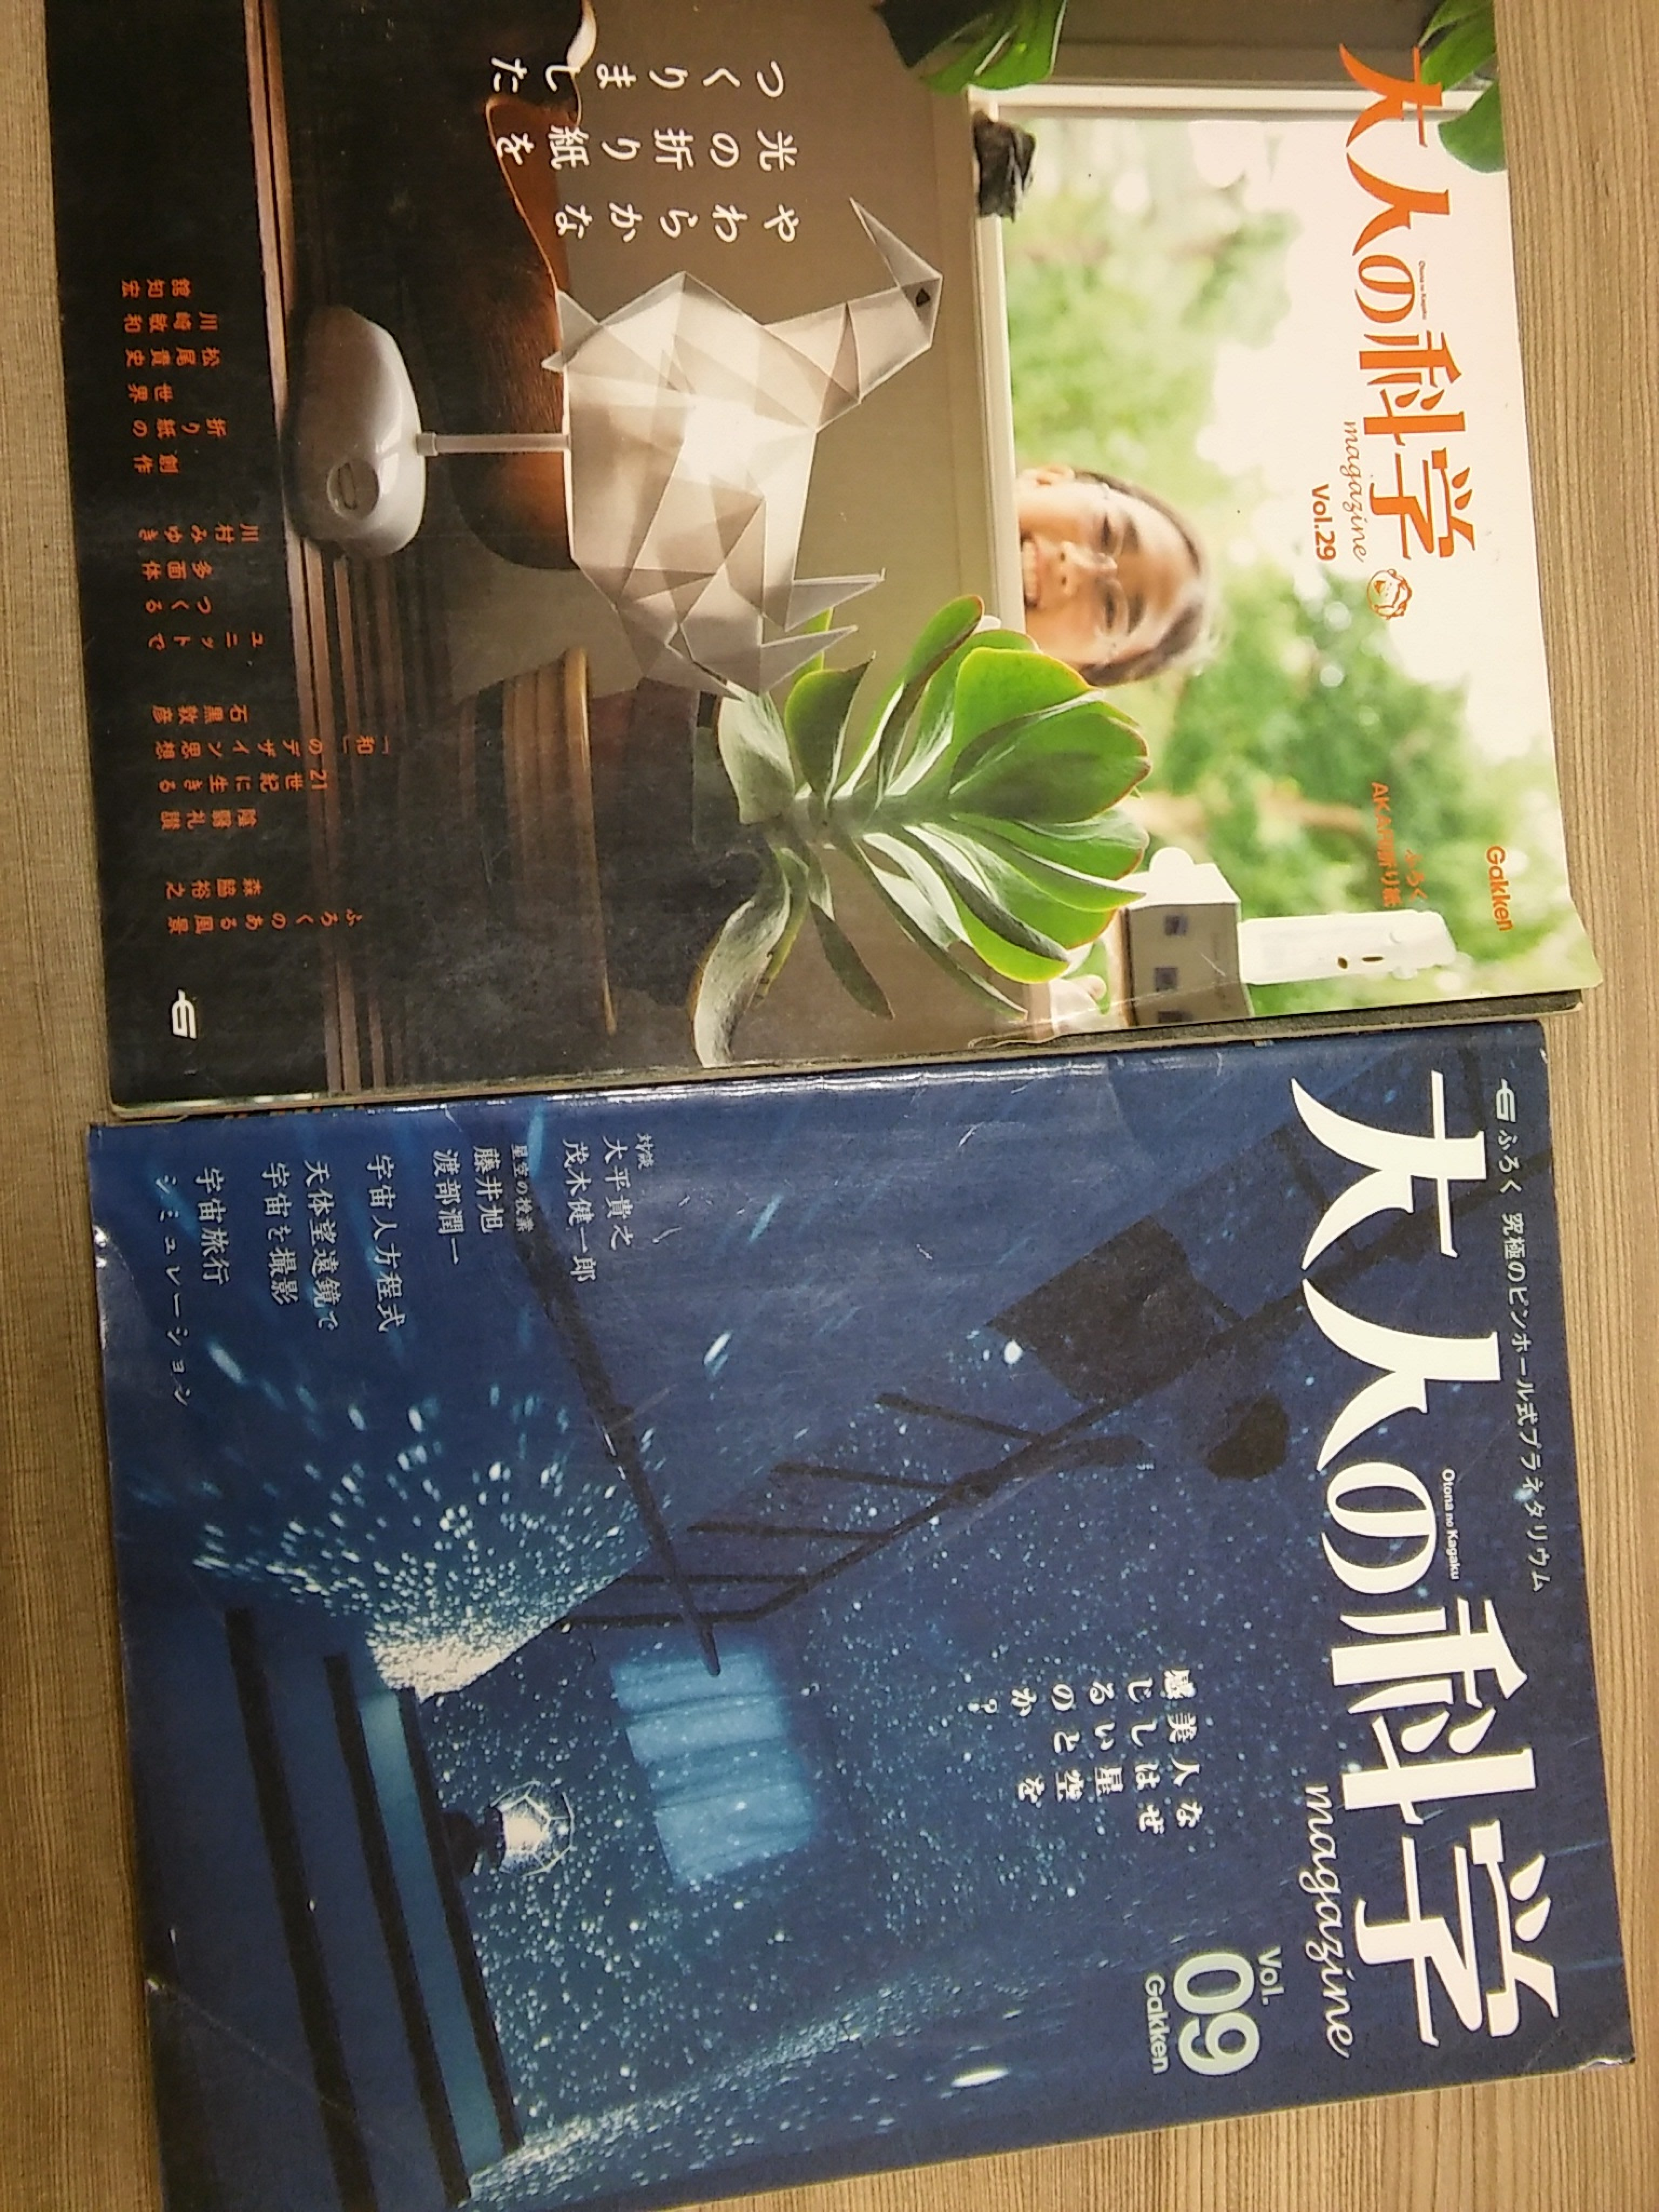 【ALX18】日文雜誌《大人的科學 vol 09+29》2本合售│天文│物理/摺紙│七成新